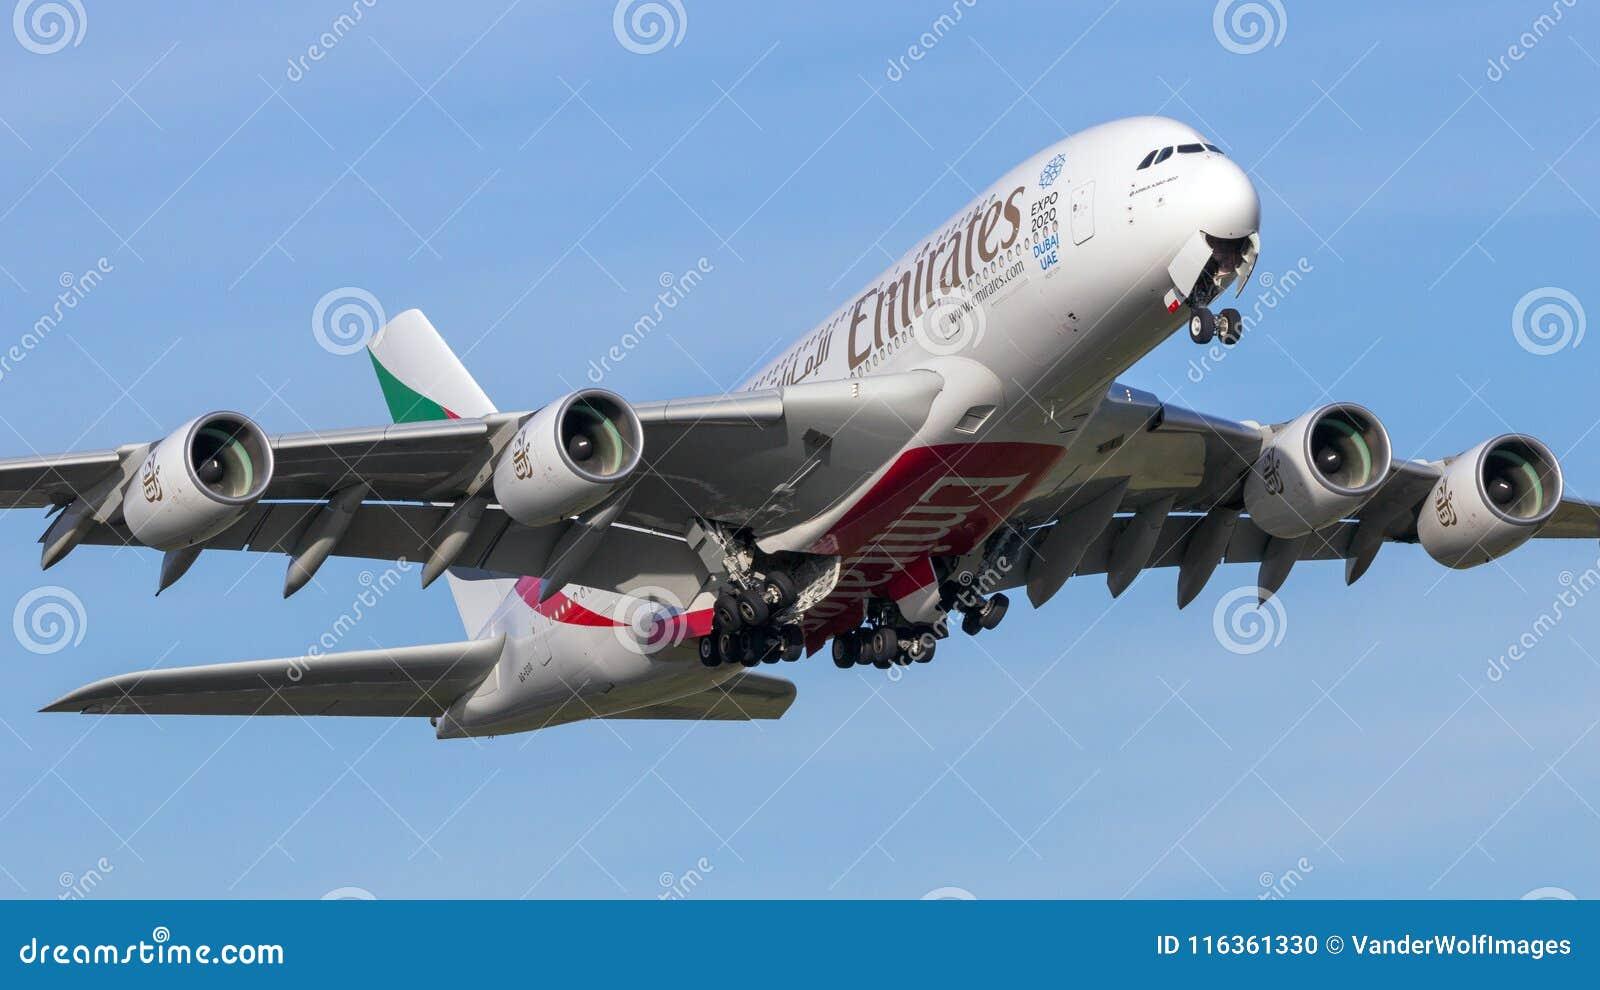 Emirates Airline Airbus A380 Passenger Plane Editorial Image